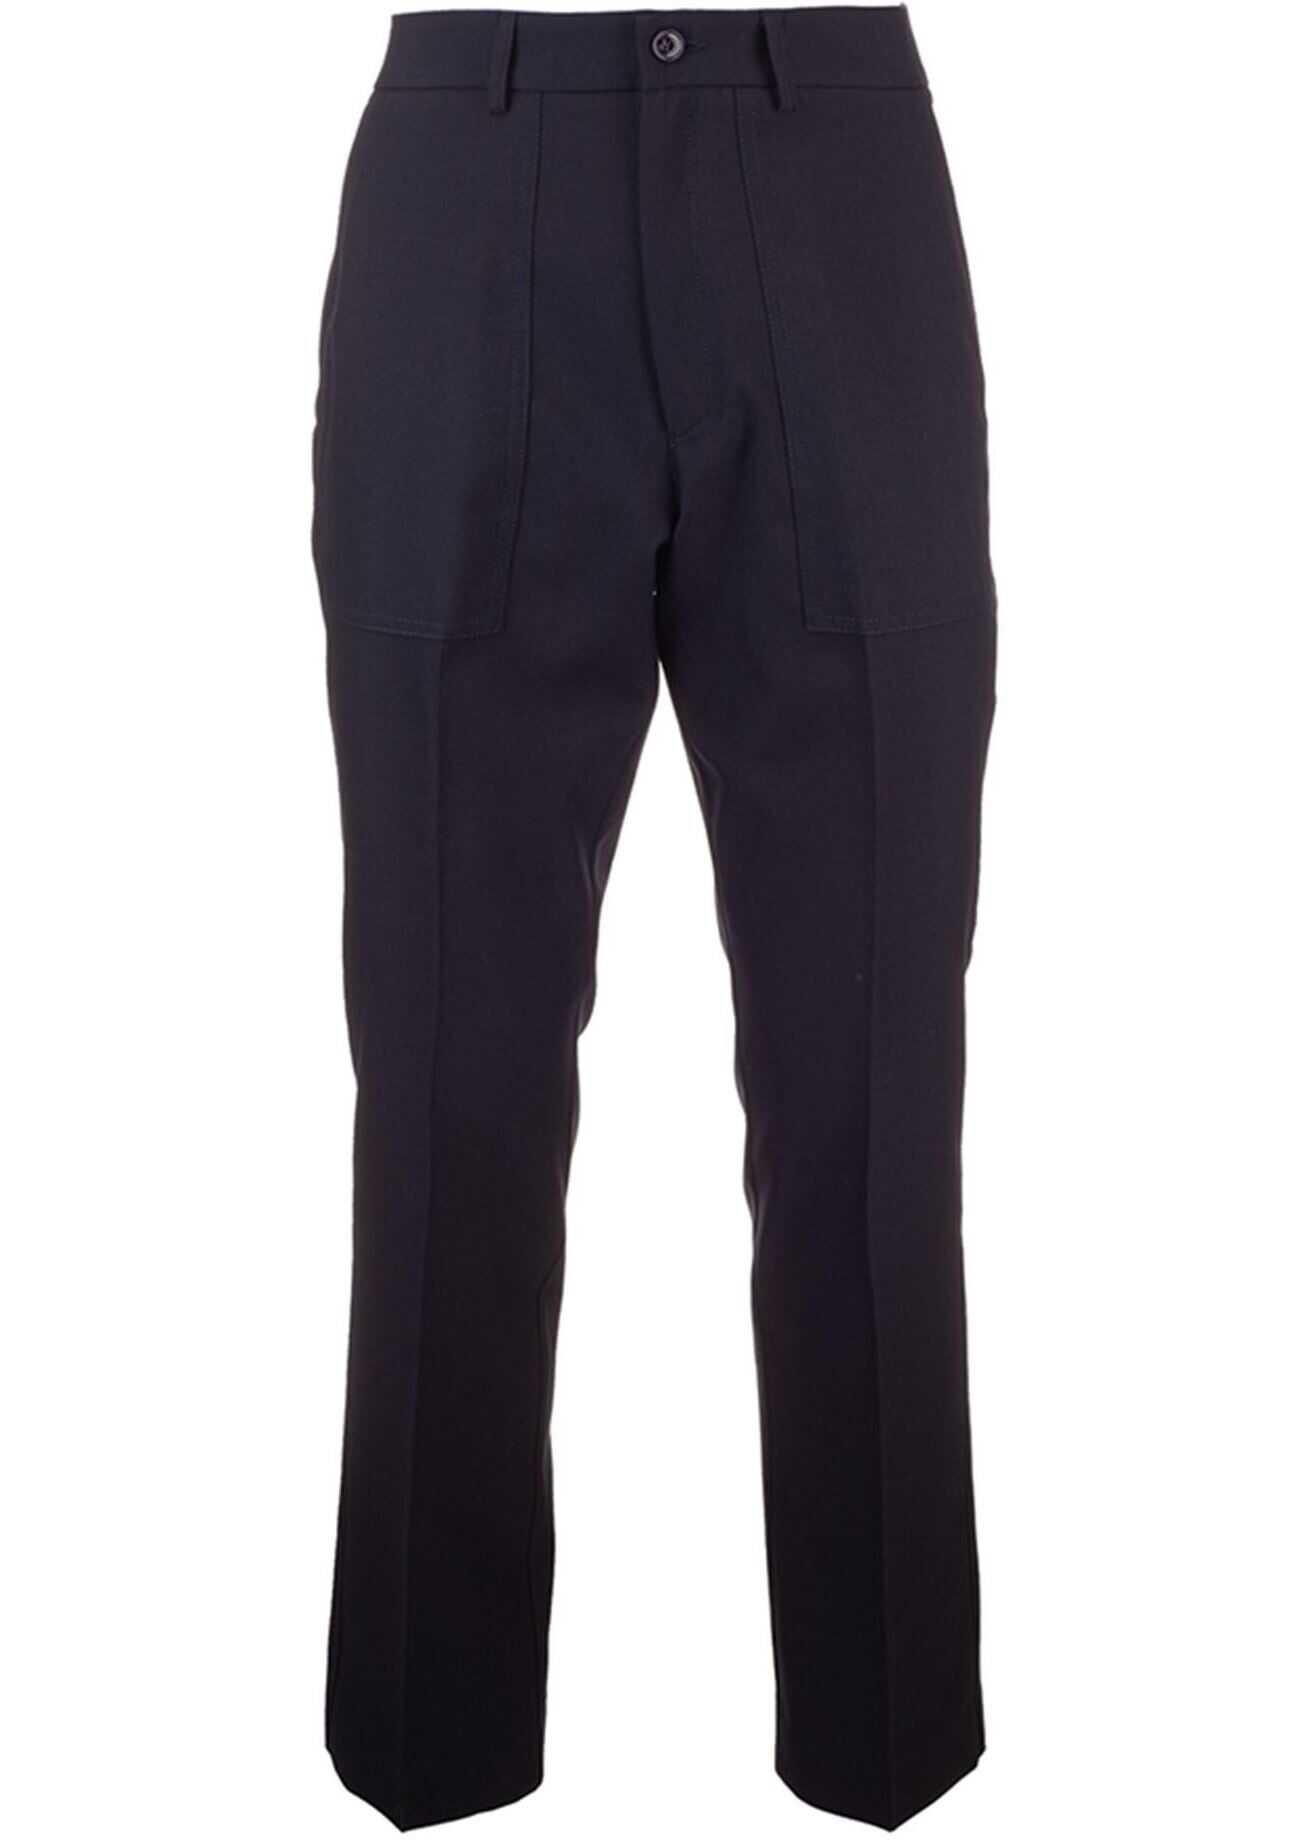 Moncler Genius 1952 Pants In Black Black imagine